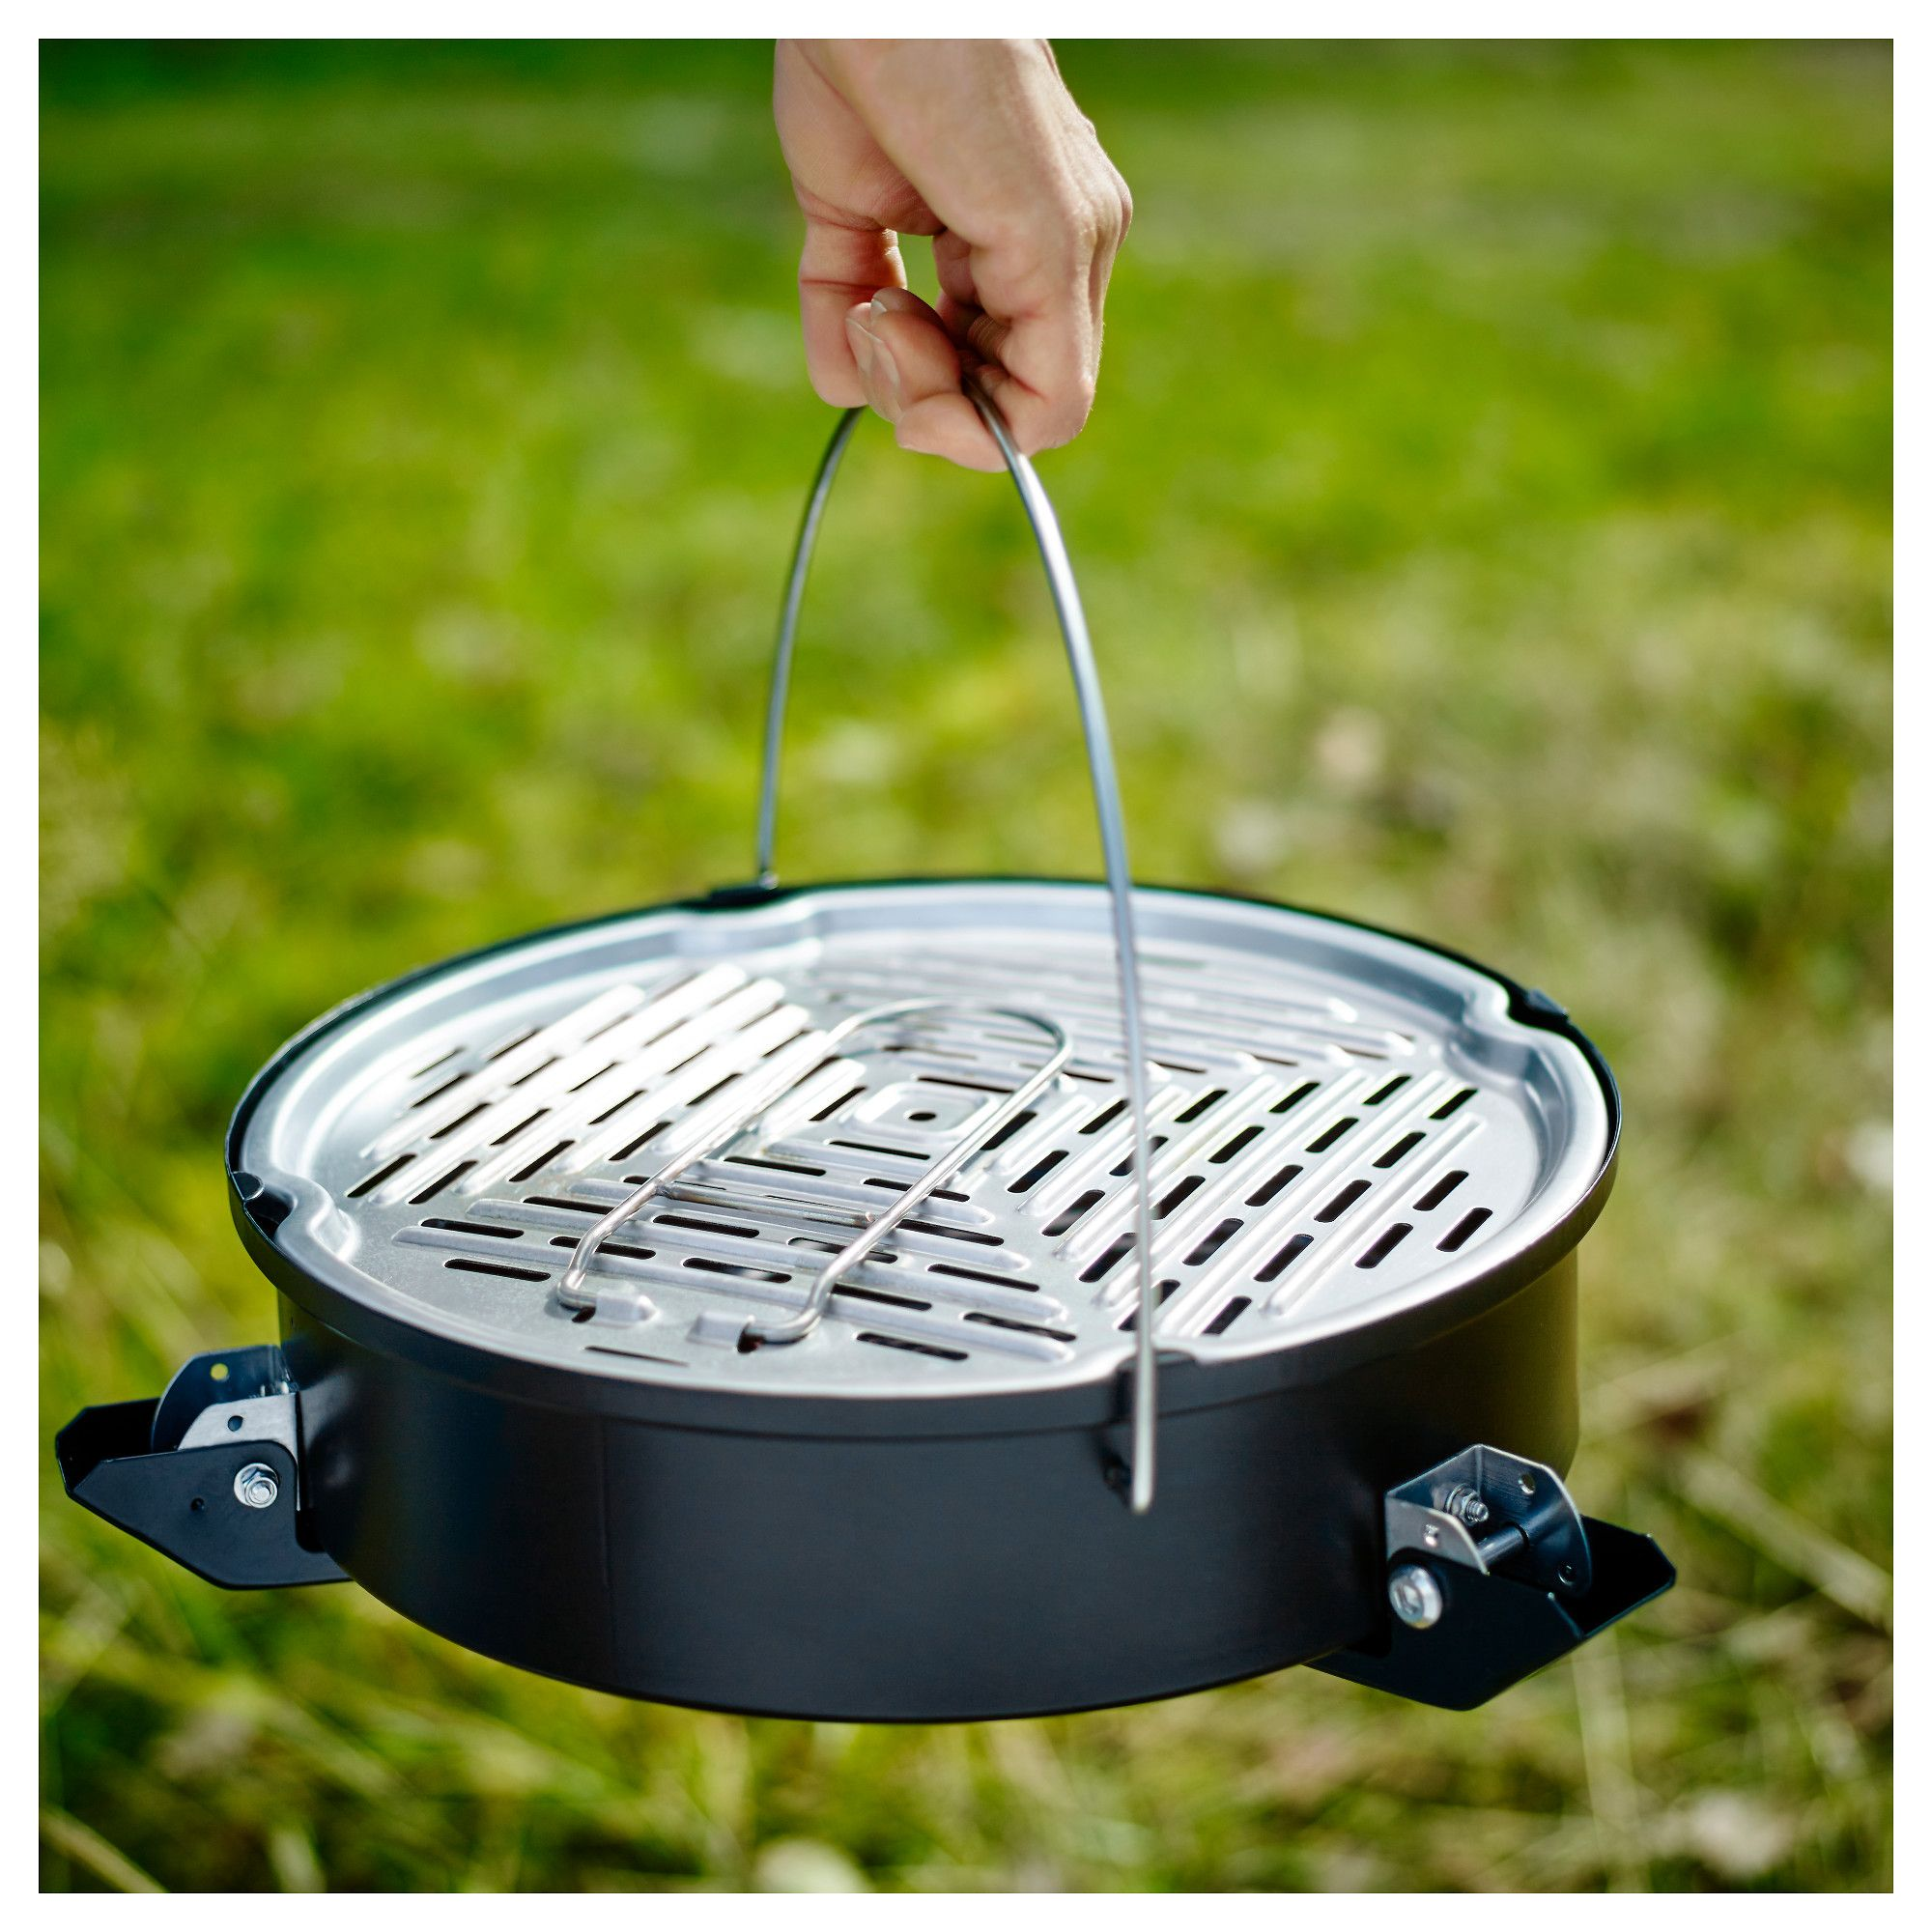 Ikea Korpon Portable Charcoal Grill Black Portable Charcoal Grill Charcoal Grill Cooking Area